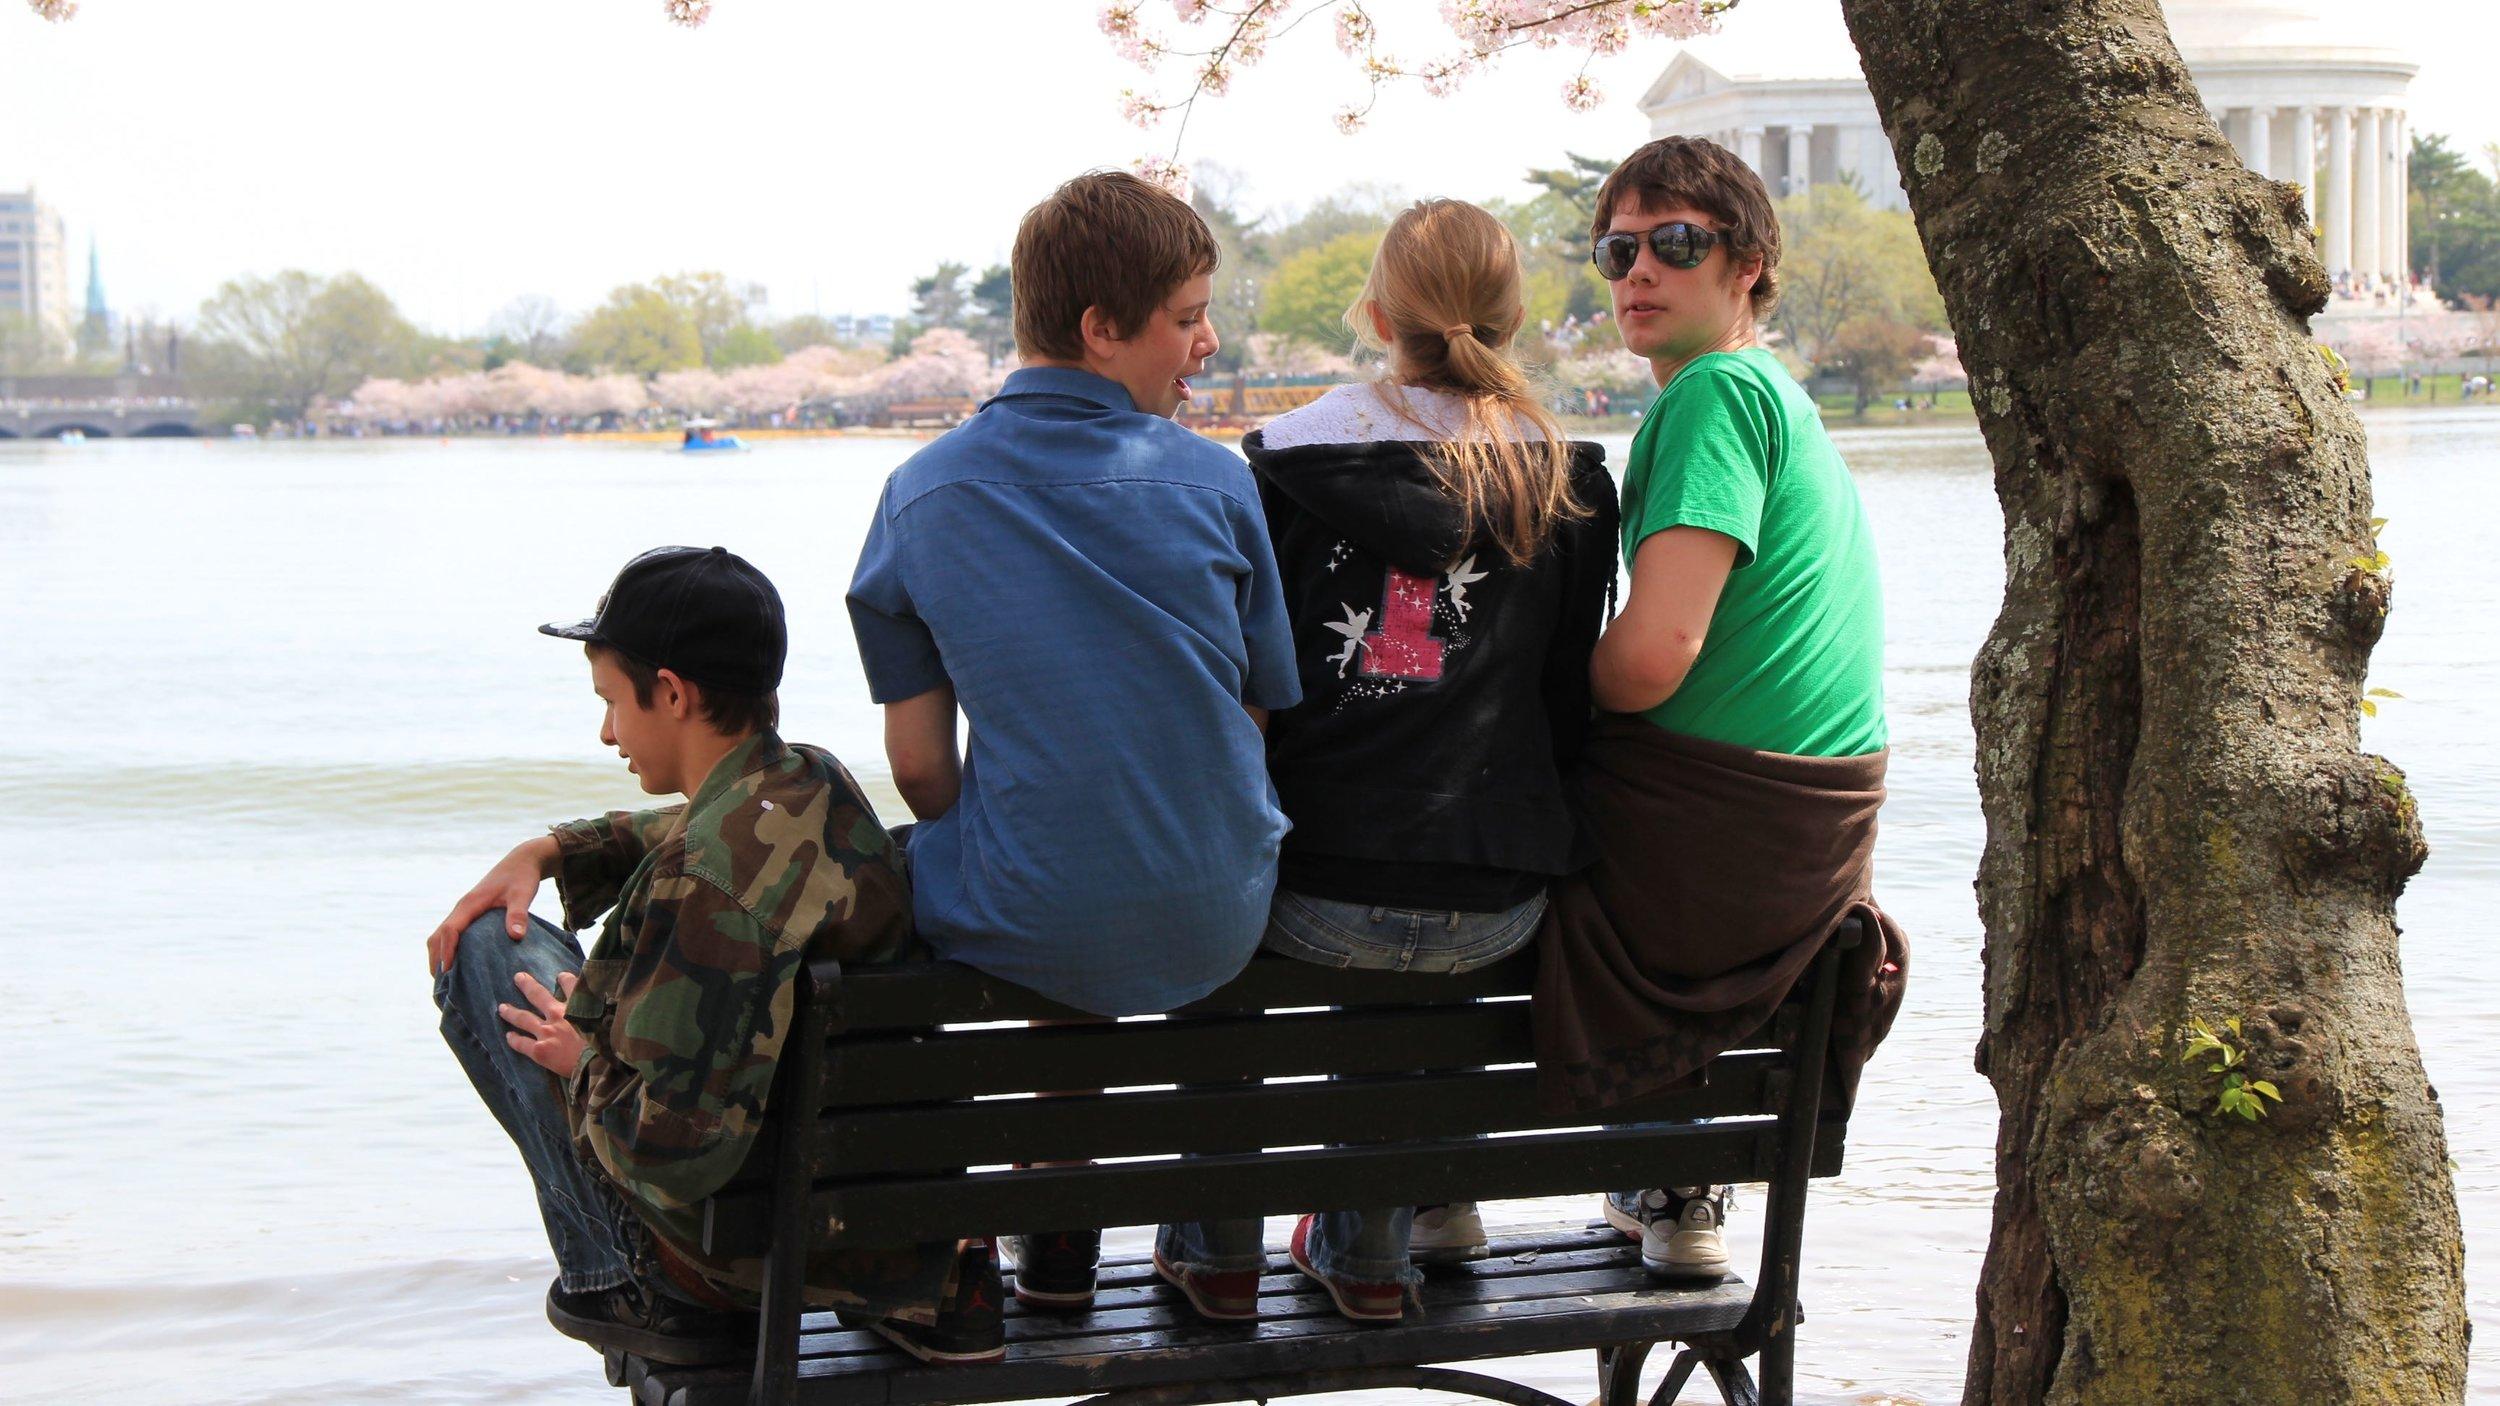 teens at cherry blossom (1).jpg